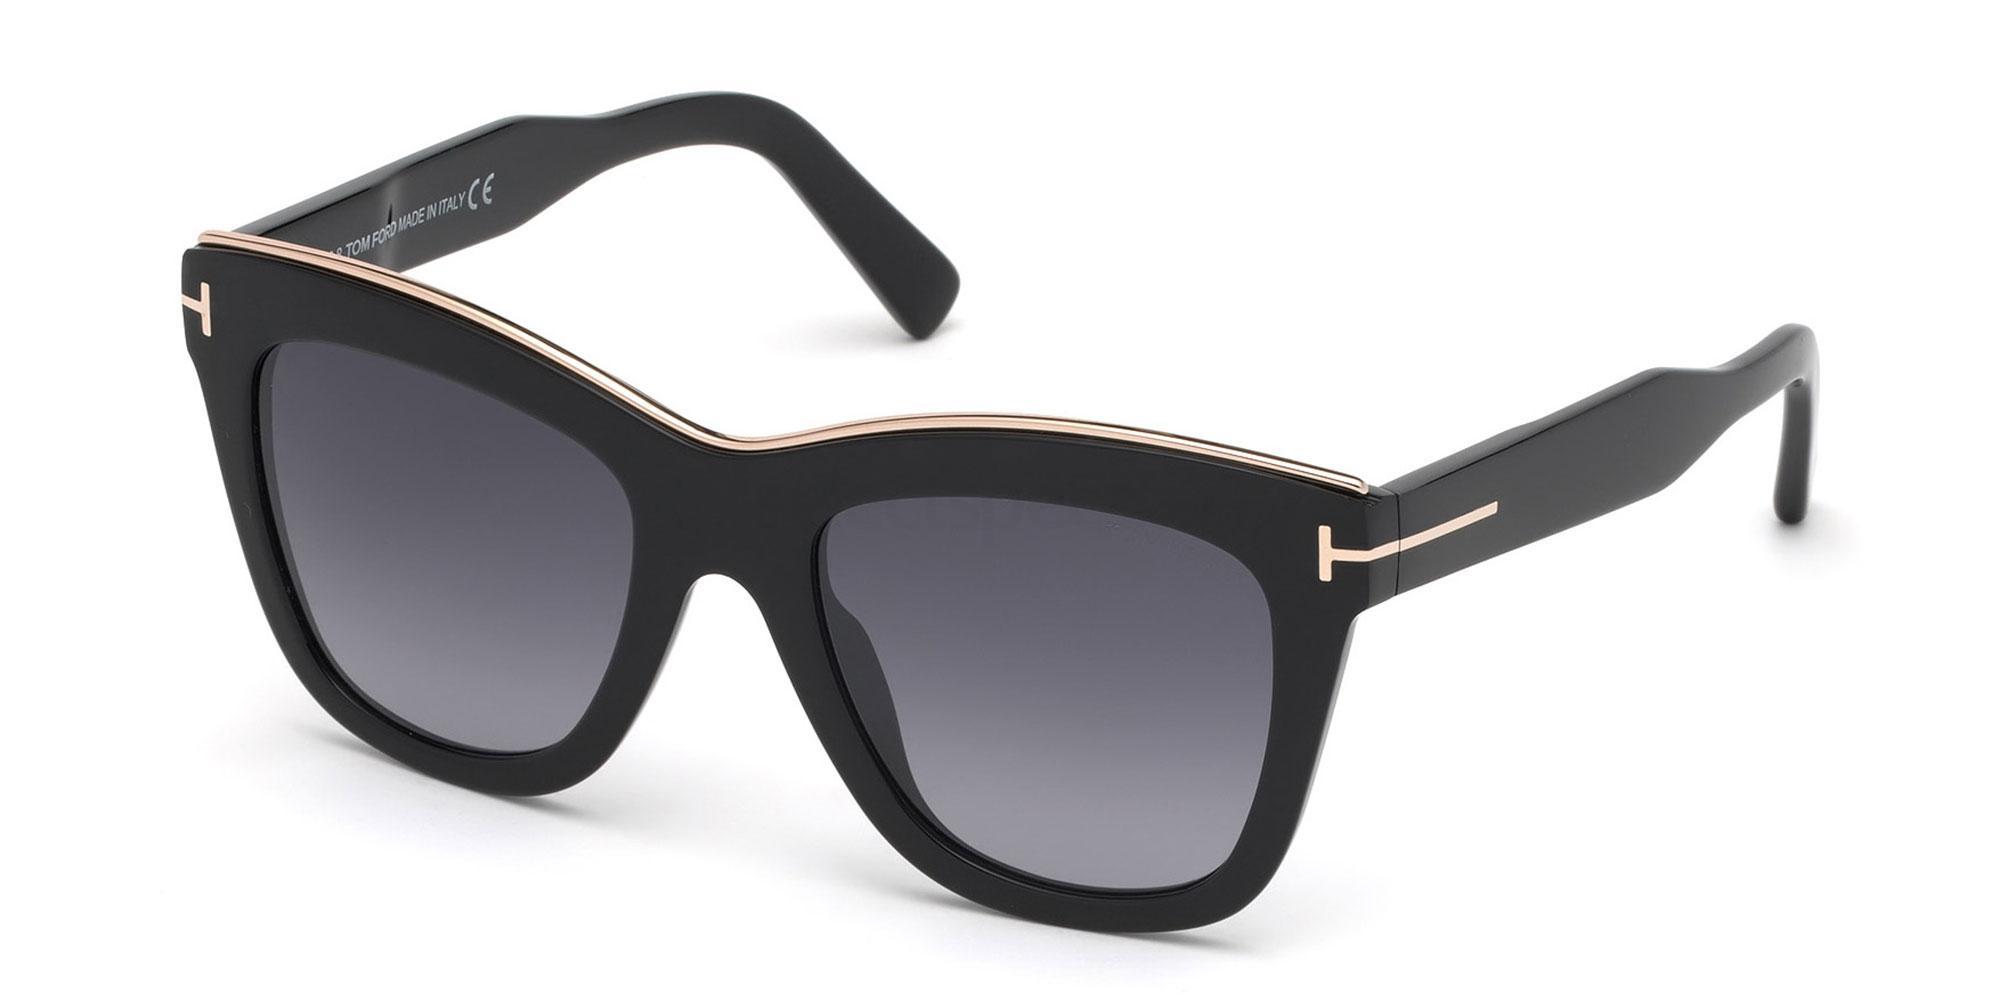 01C FT0685 Sunglasses, Tom Ford